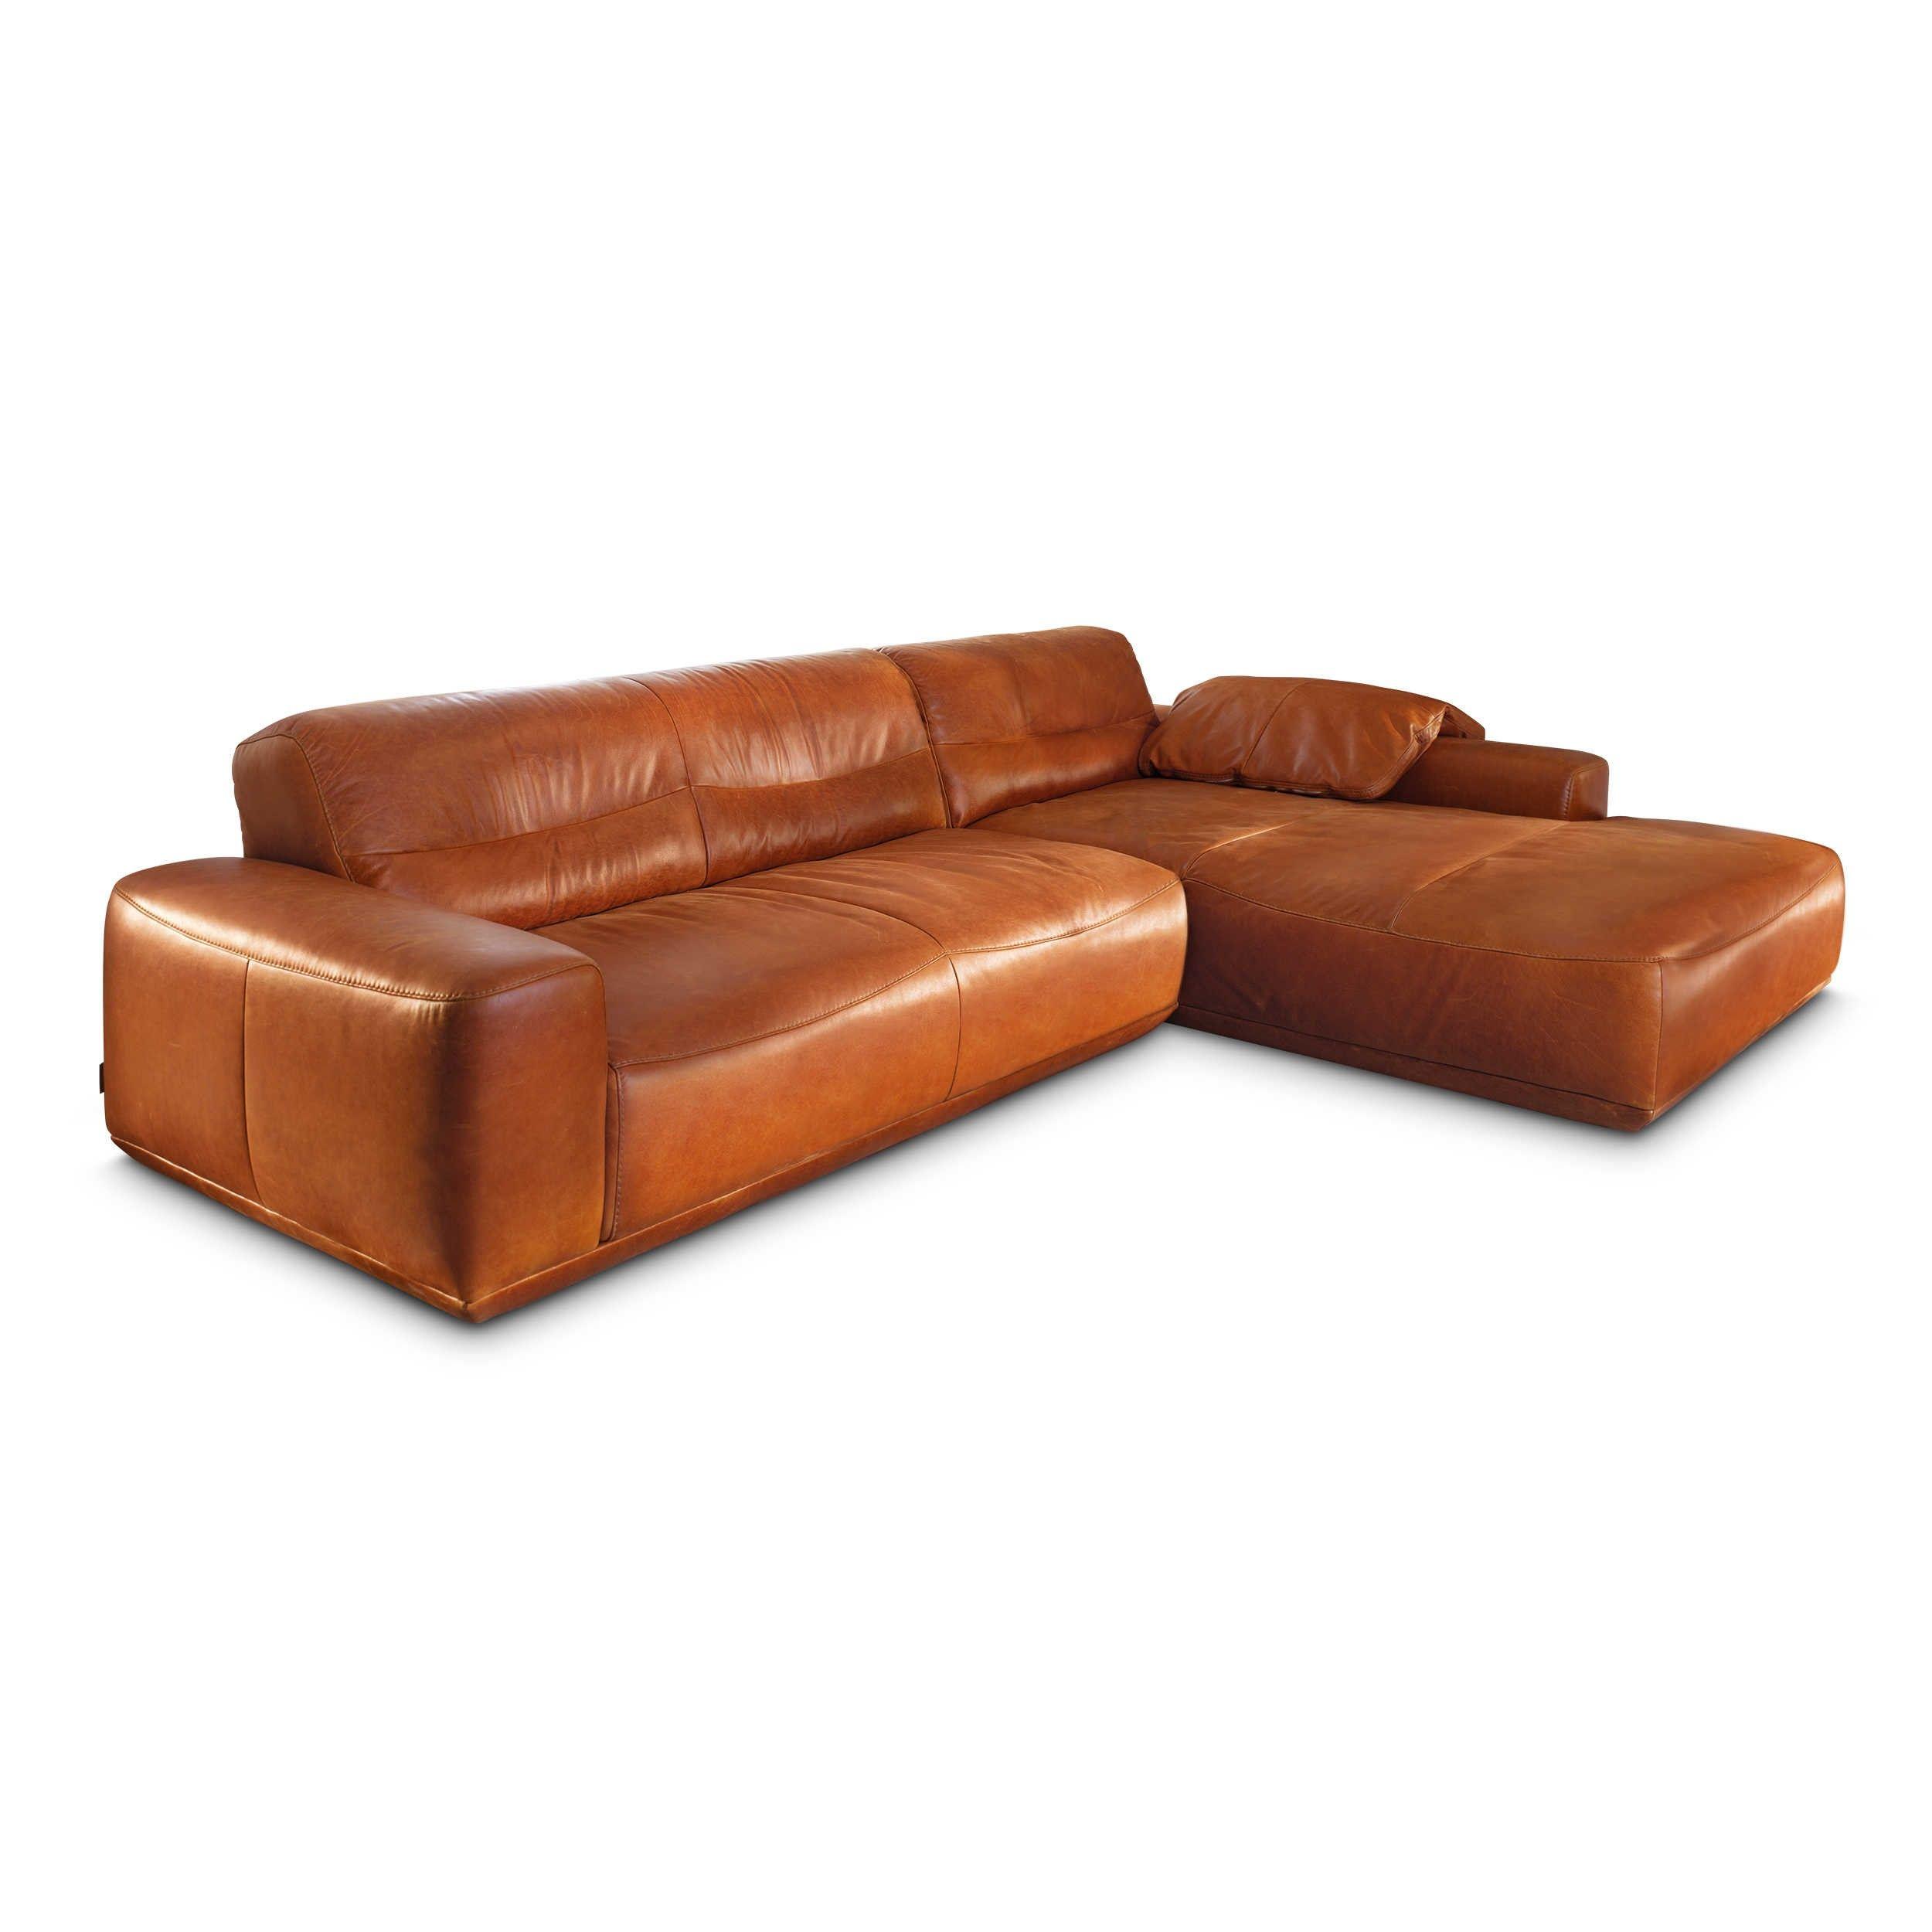 willi schillig ecksofa 20560 william braun leder living room und. Black Bedroom Furniture Sets. Home Design Ideas